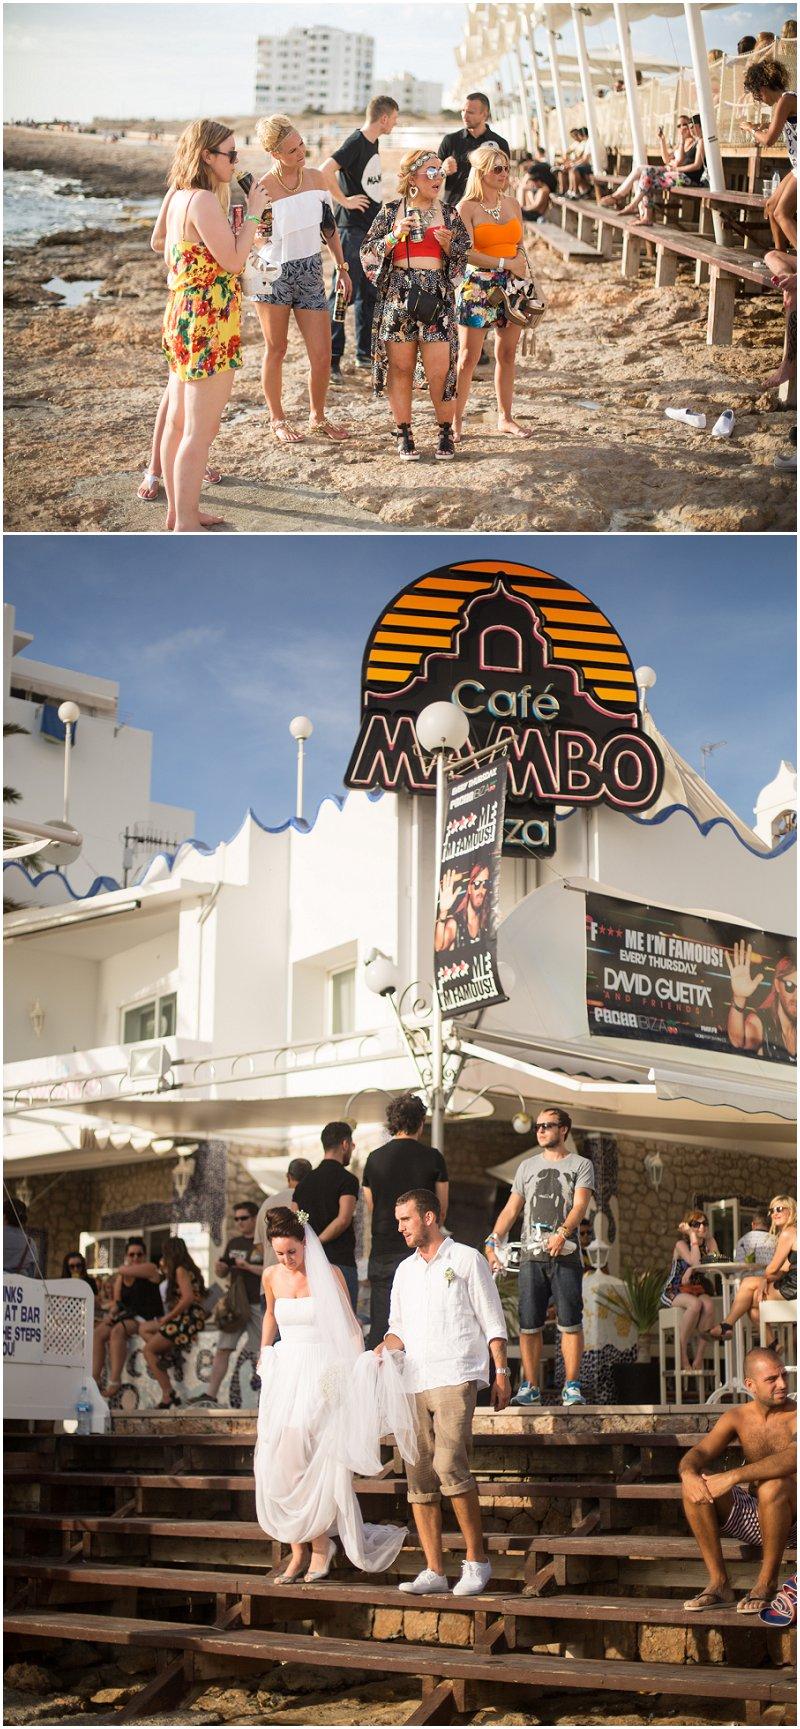 Cafe Mambo wedding photography Ibiza, Spain Destination Photographer